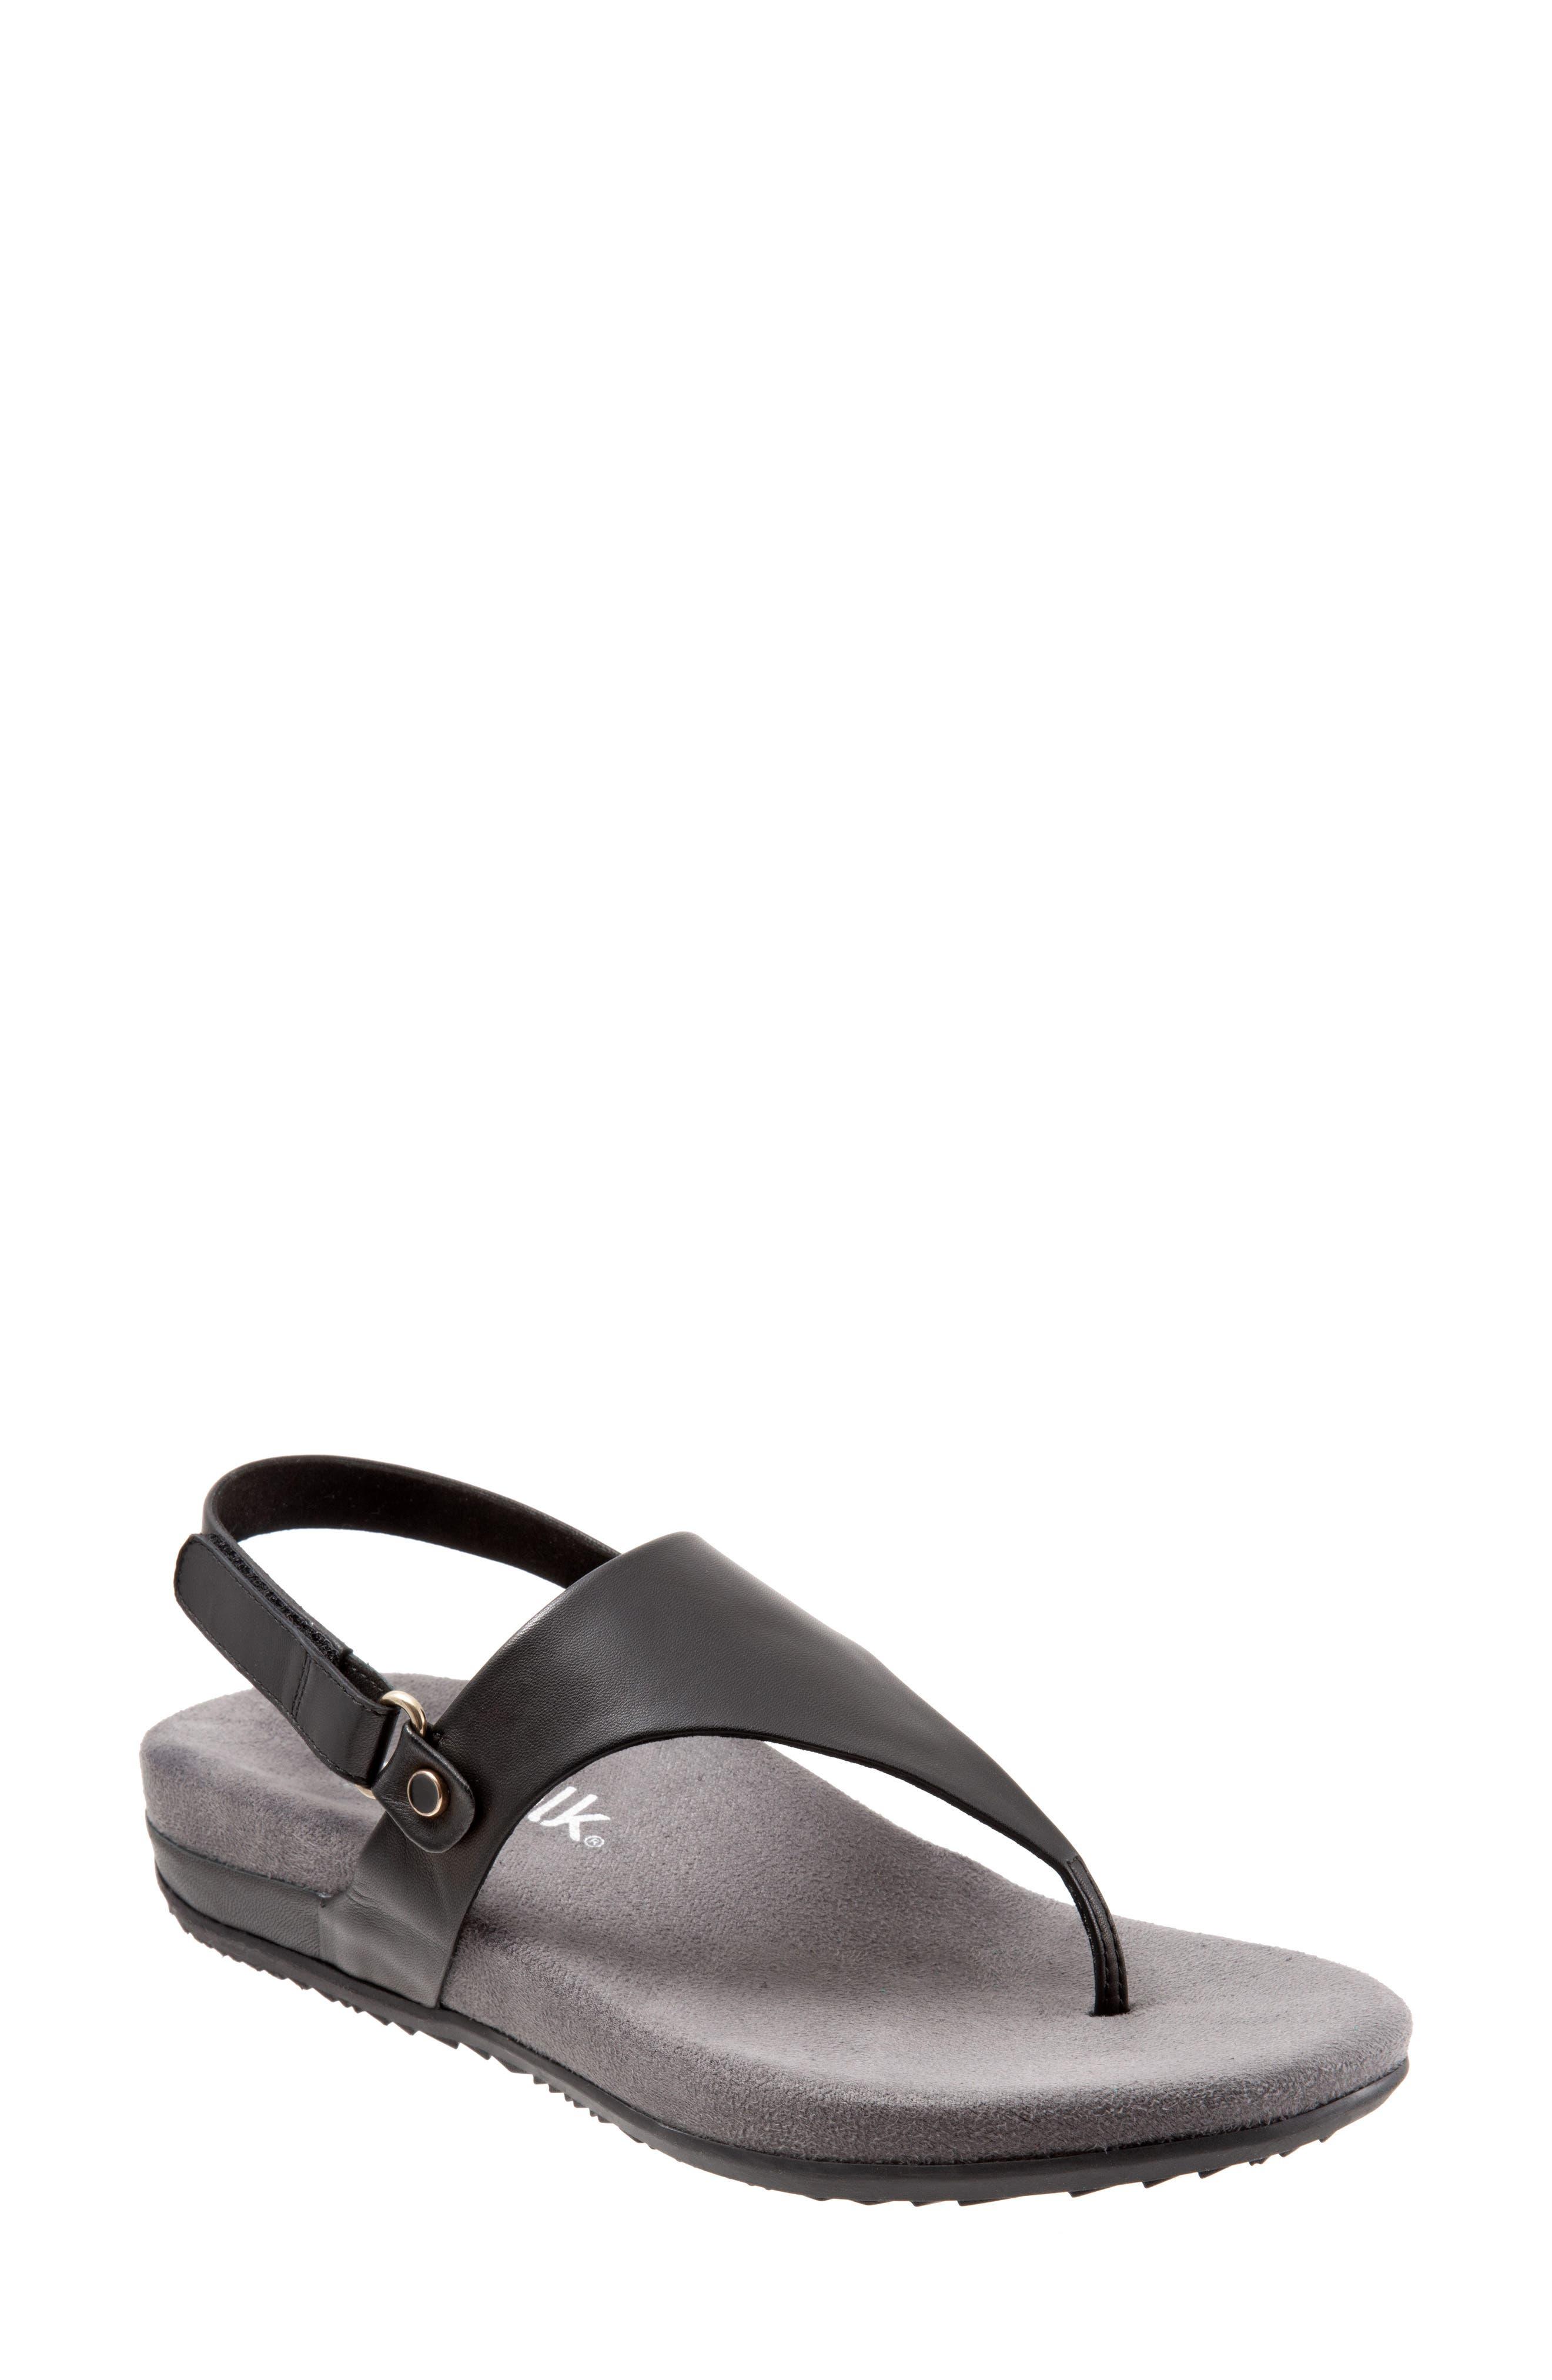 Softwalk Bolinas V-Strap Sandal, Black